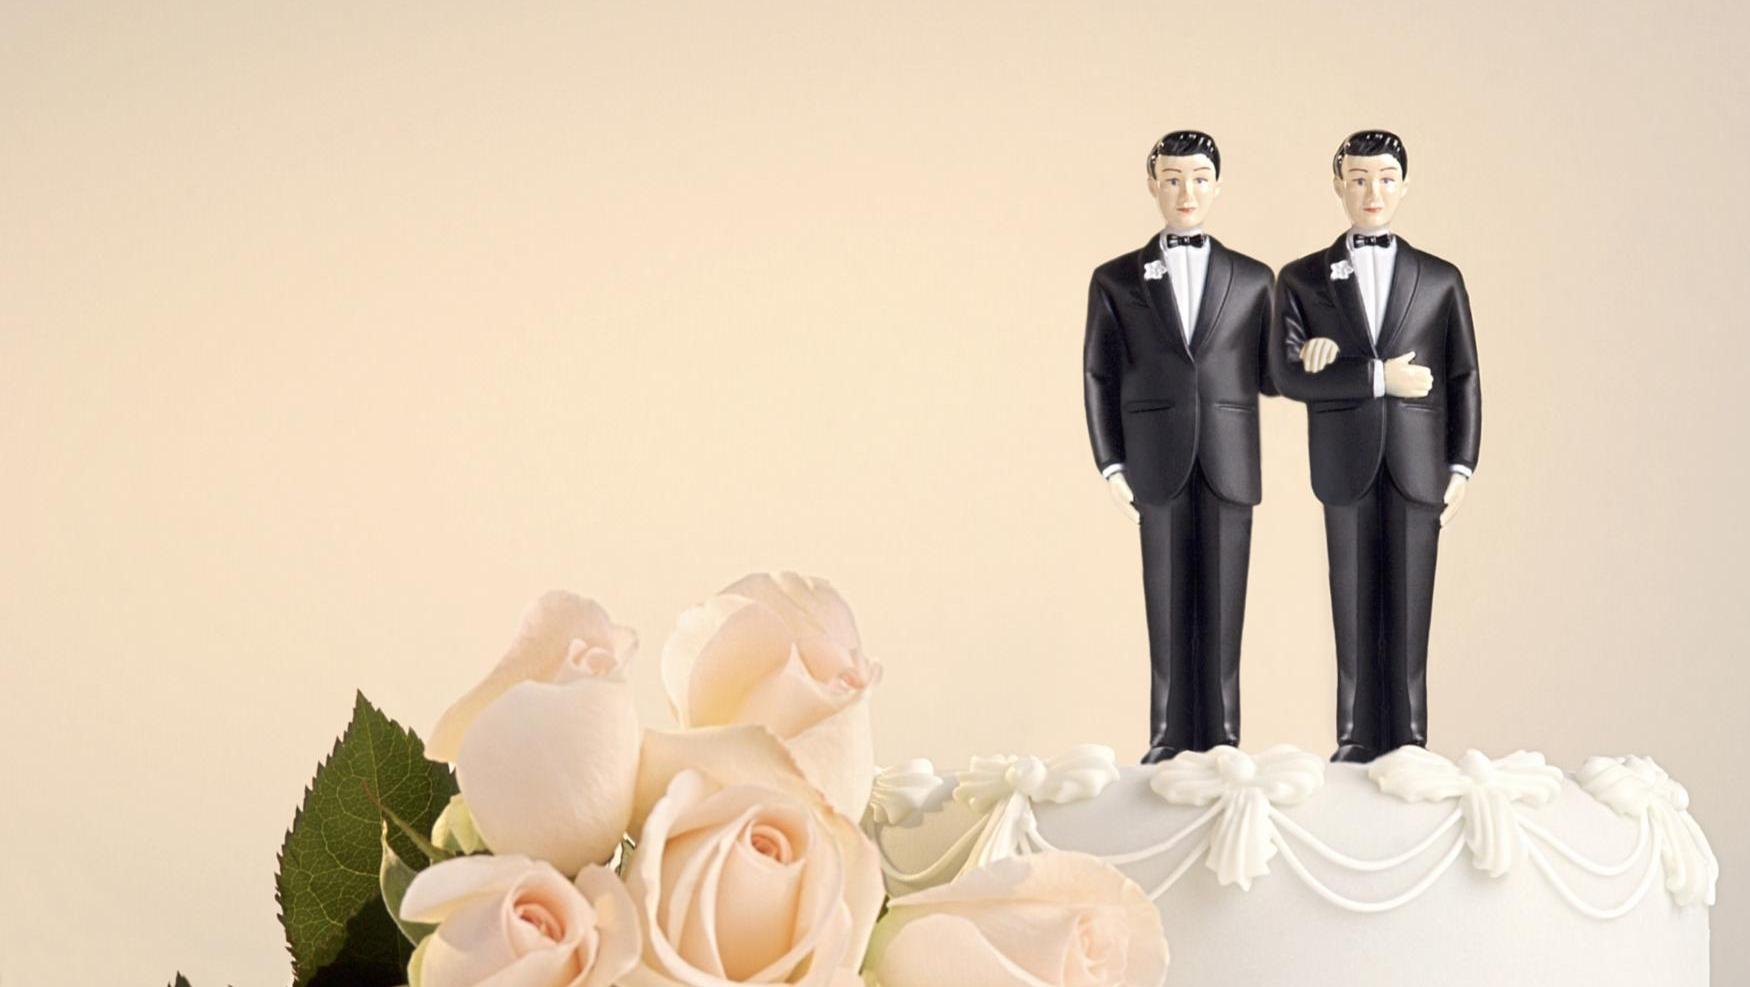 mariage gay essaouira info ou intox wwwle360ma - Figurine Mariage Gay